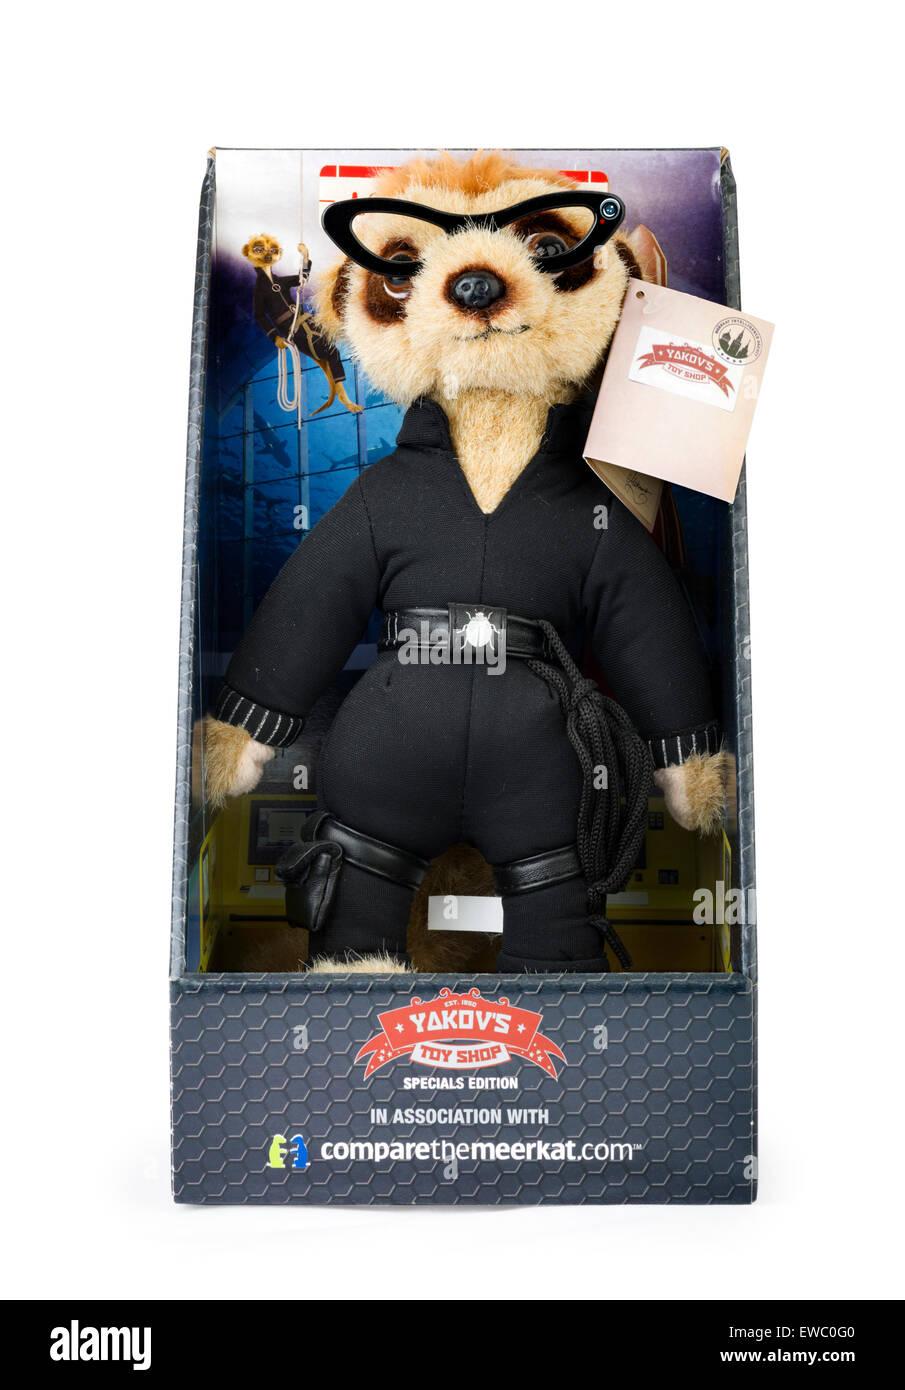 Agent Maiya meerkat toy from Comparethemarket.com price comparison website, UK - Stock Image